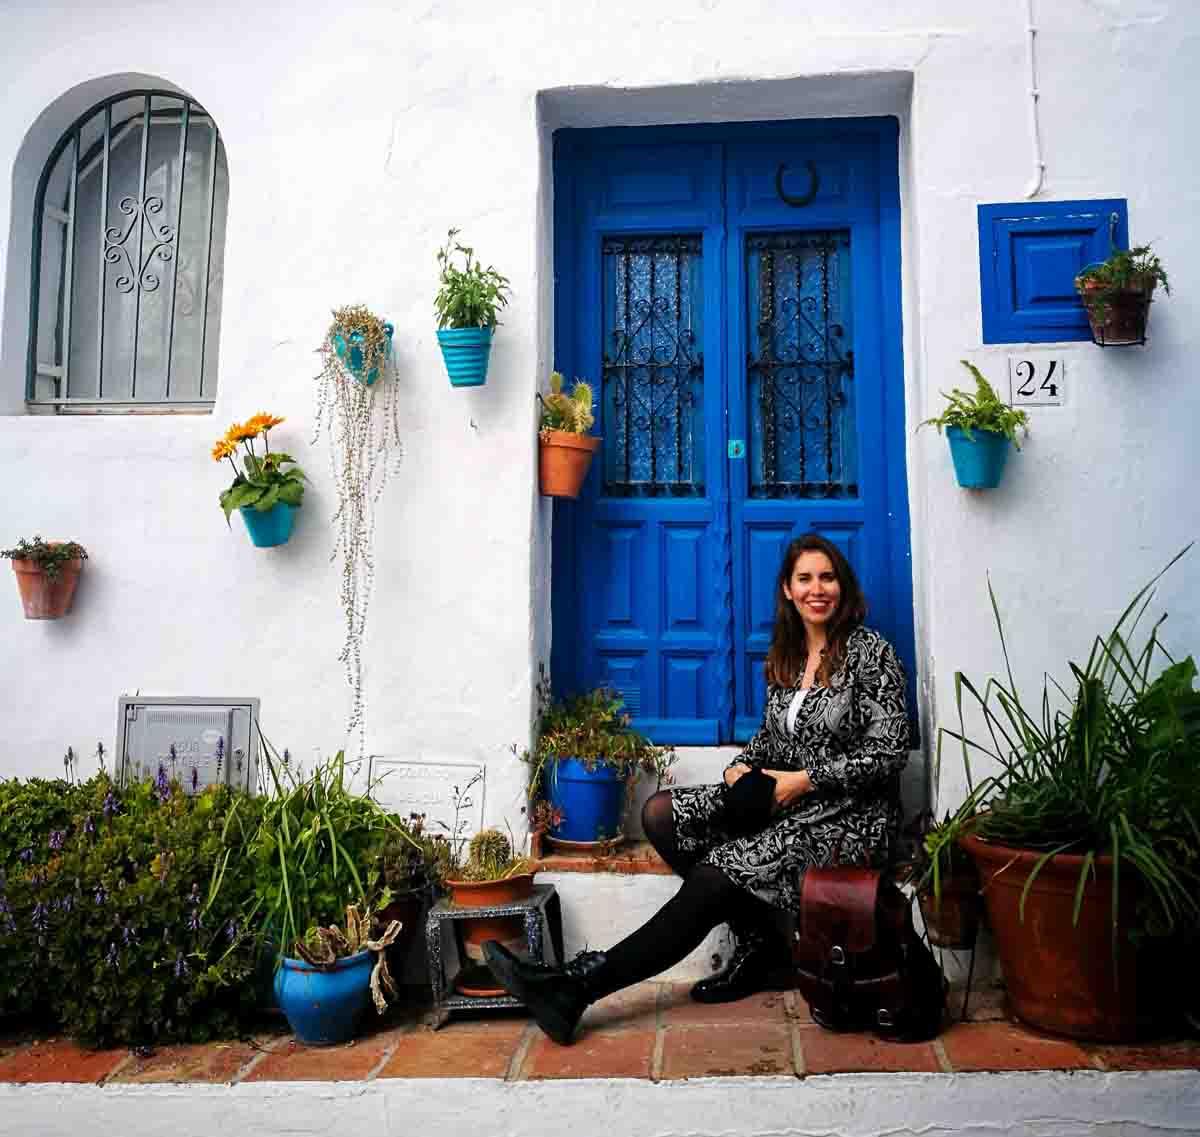 Ruta por Andalucía: Frigiliana